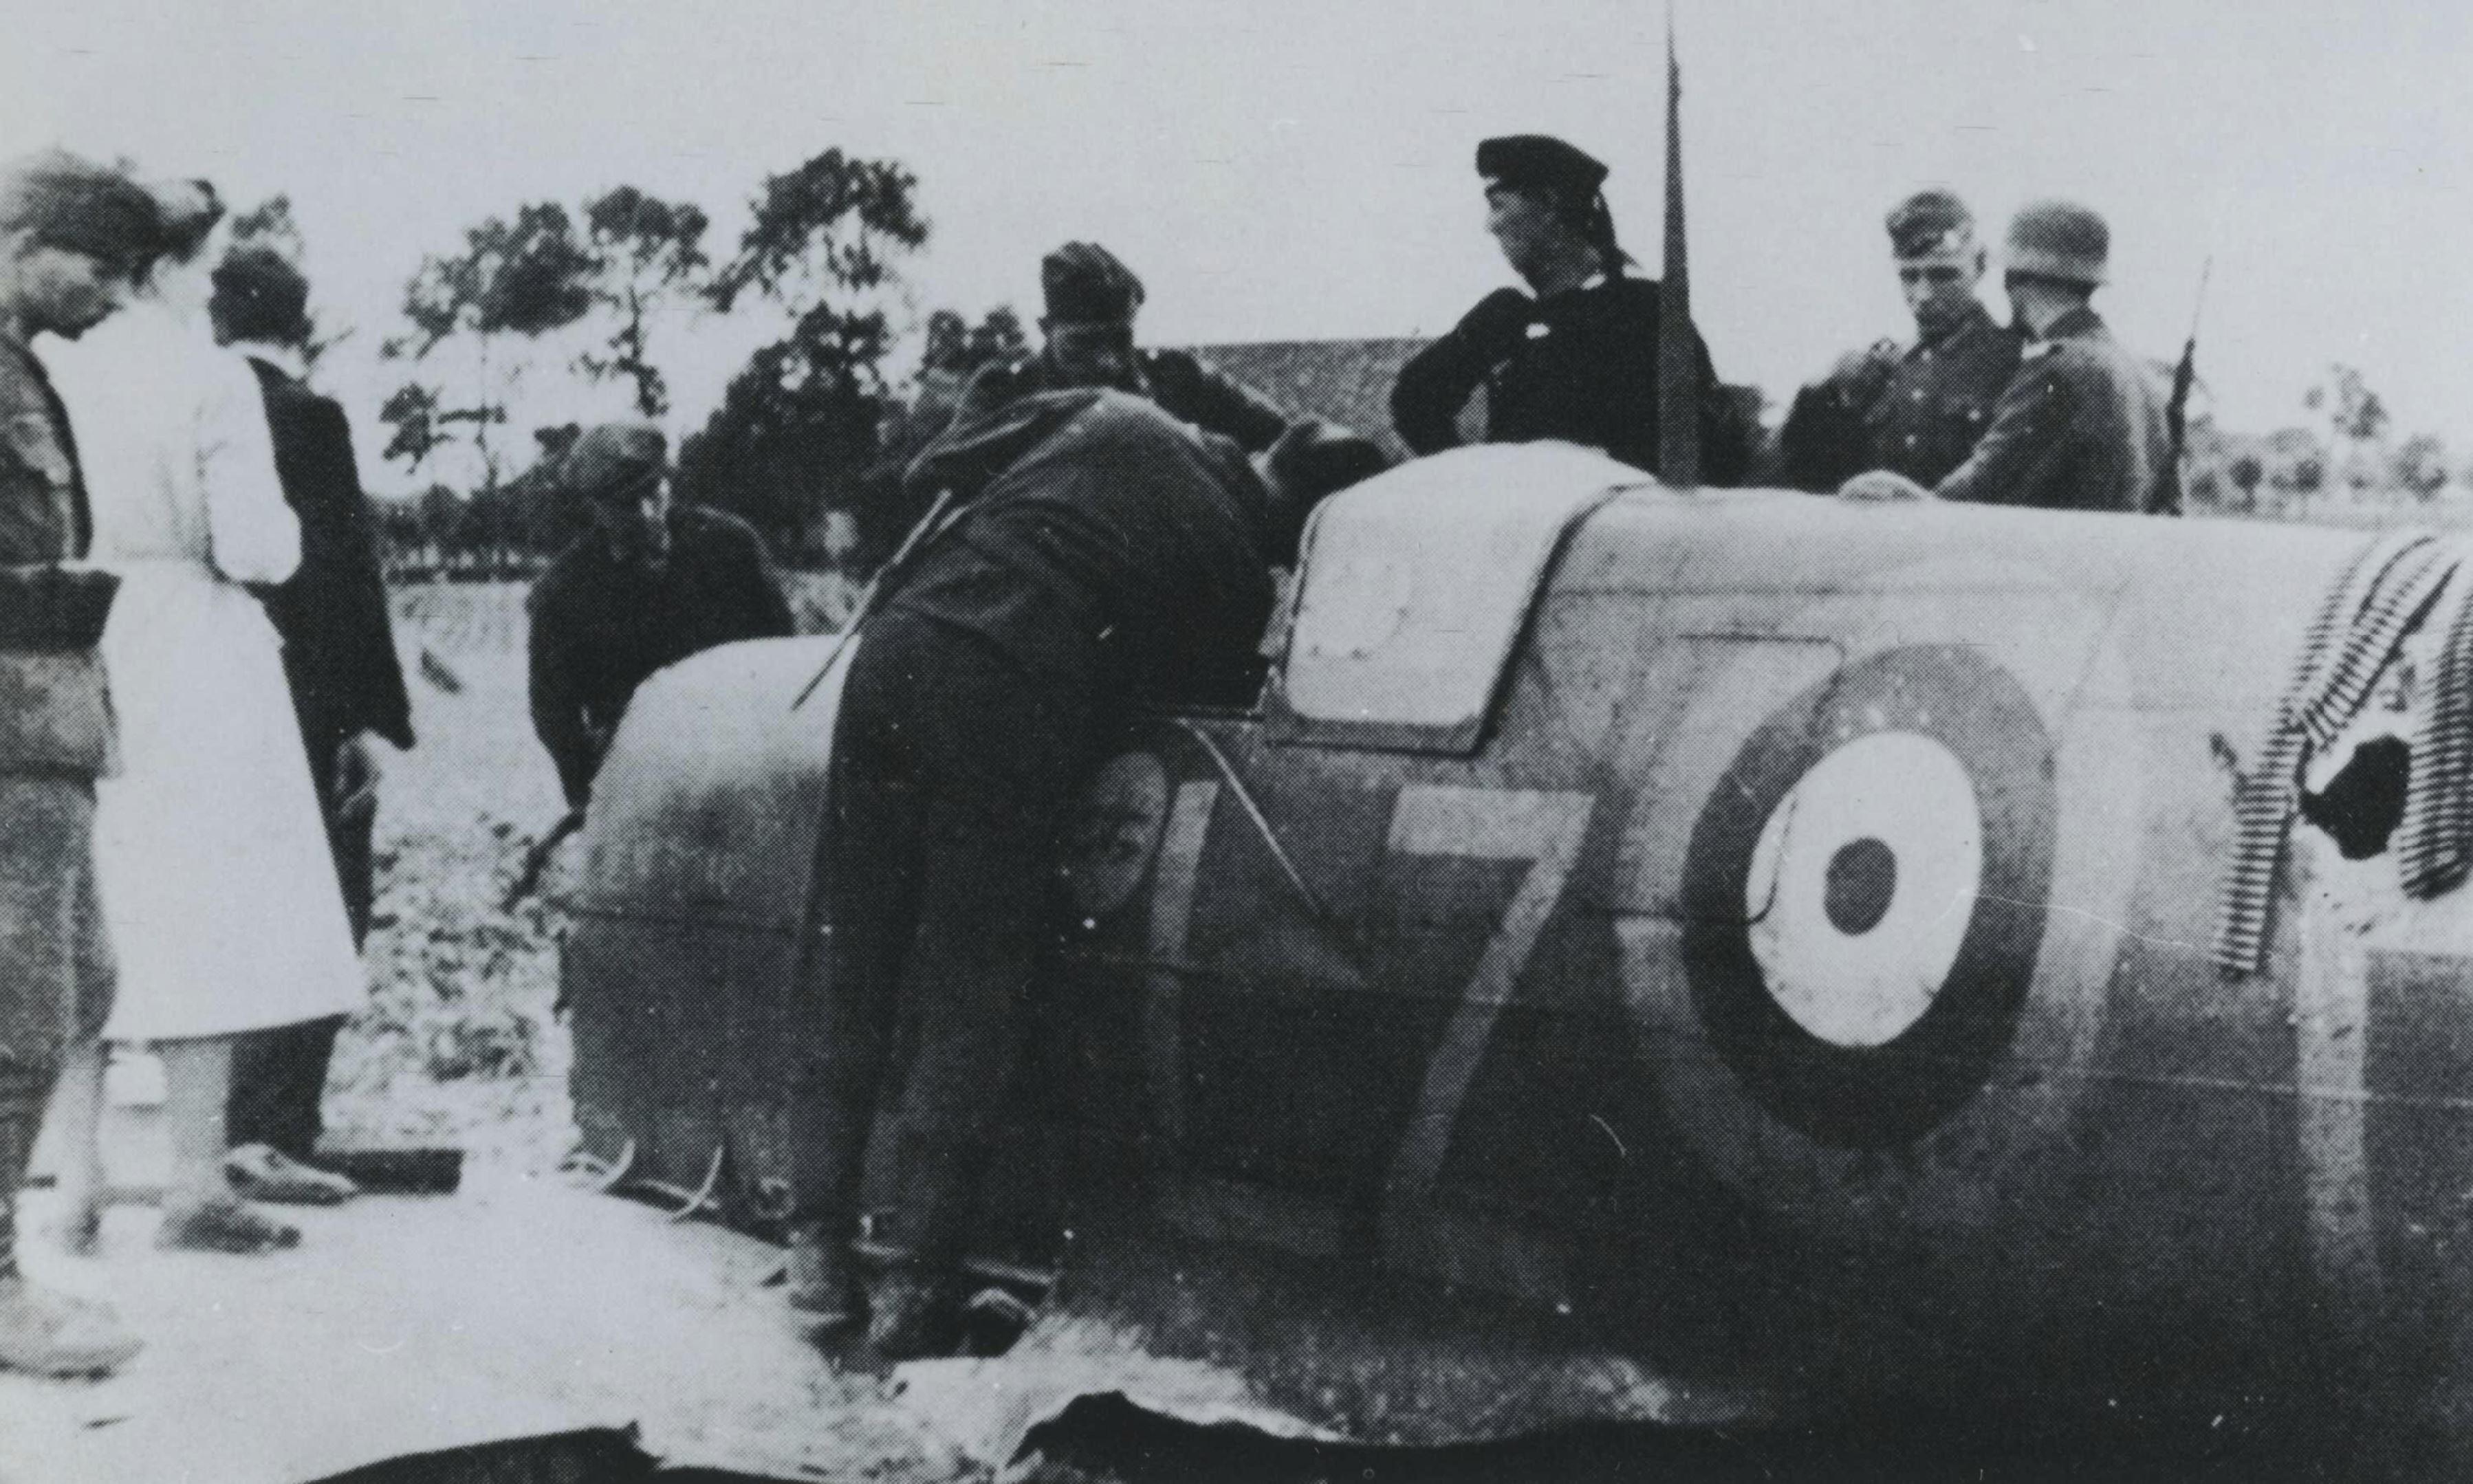 Spitfire RAF 66Sqn LZP Stevens P7787 sd by JG52 nr Groede 1POW 12th Aug 1941 NIOD